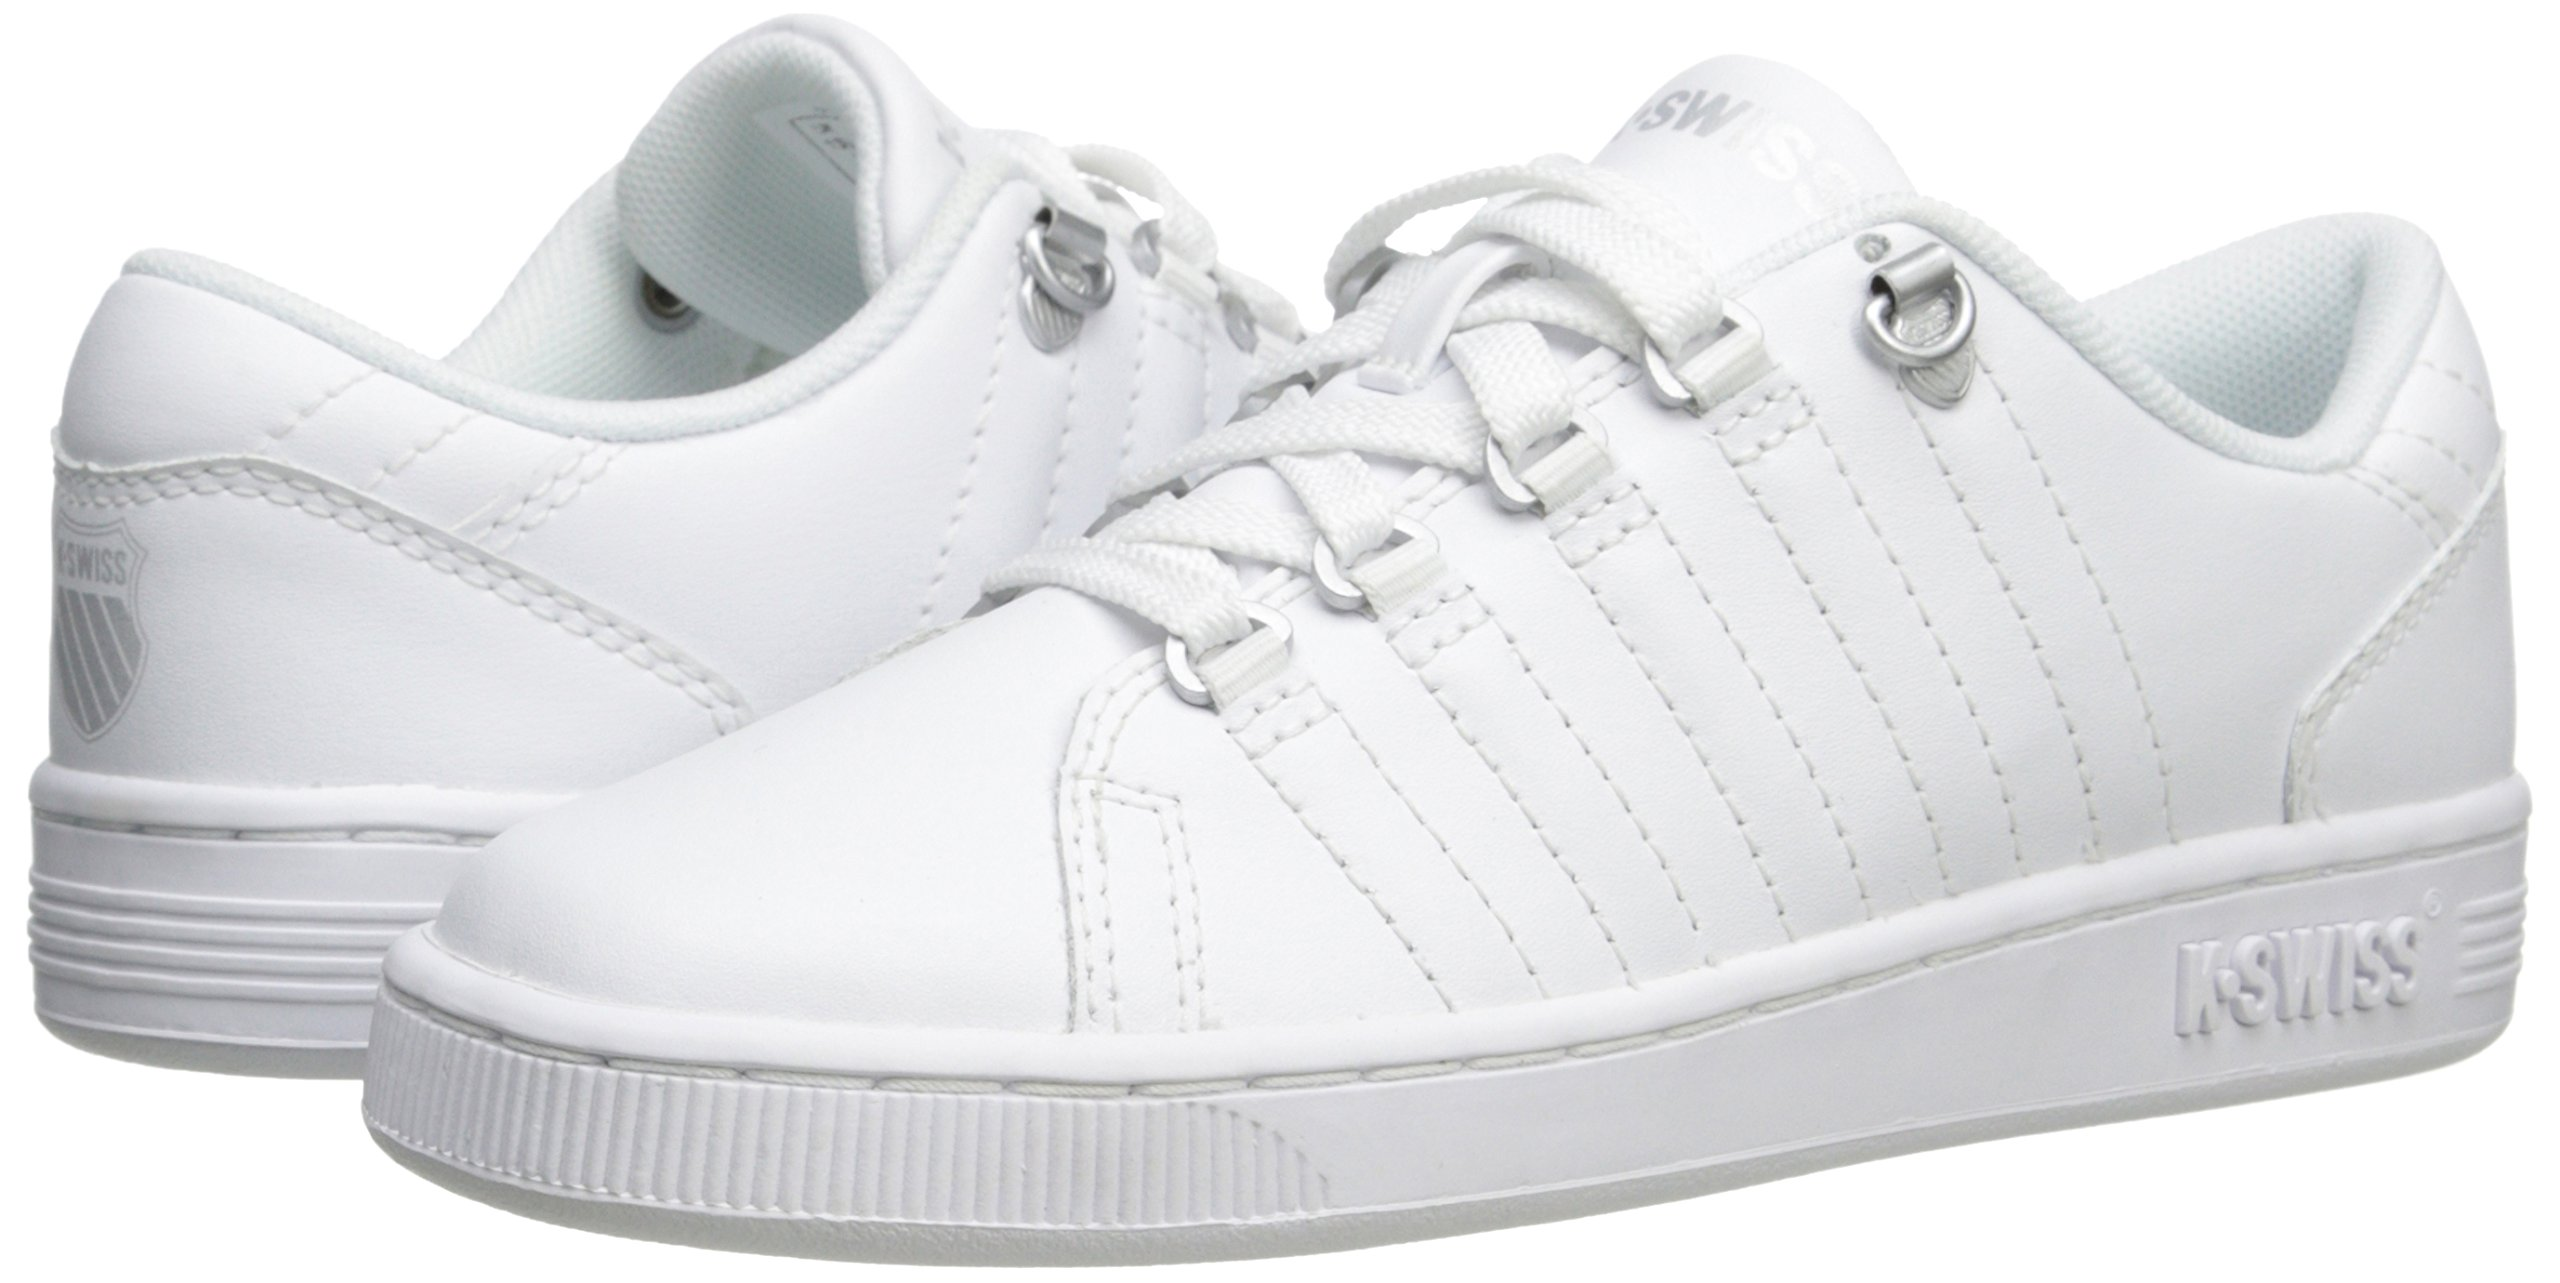 K-Swiss 8110 Lozan Sneaker (Big Kid),White/White/Silver,3.5 M US Big Kid by K-Swiss (Image #6)